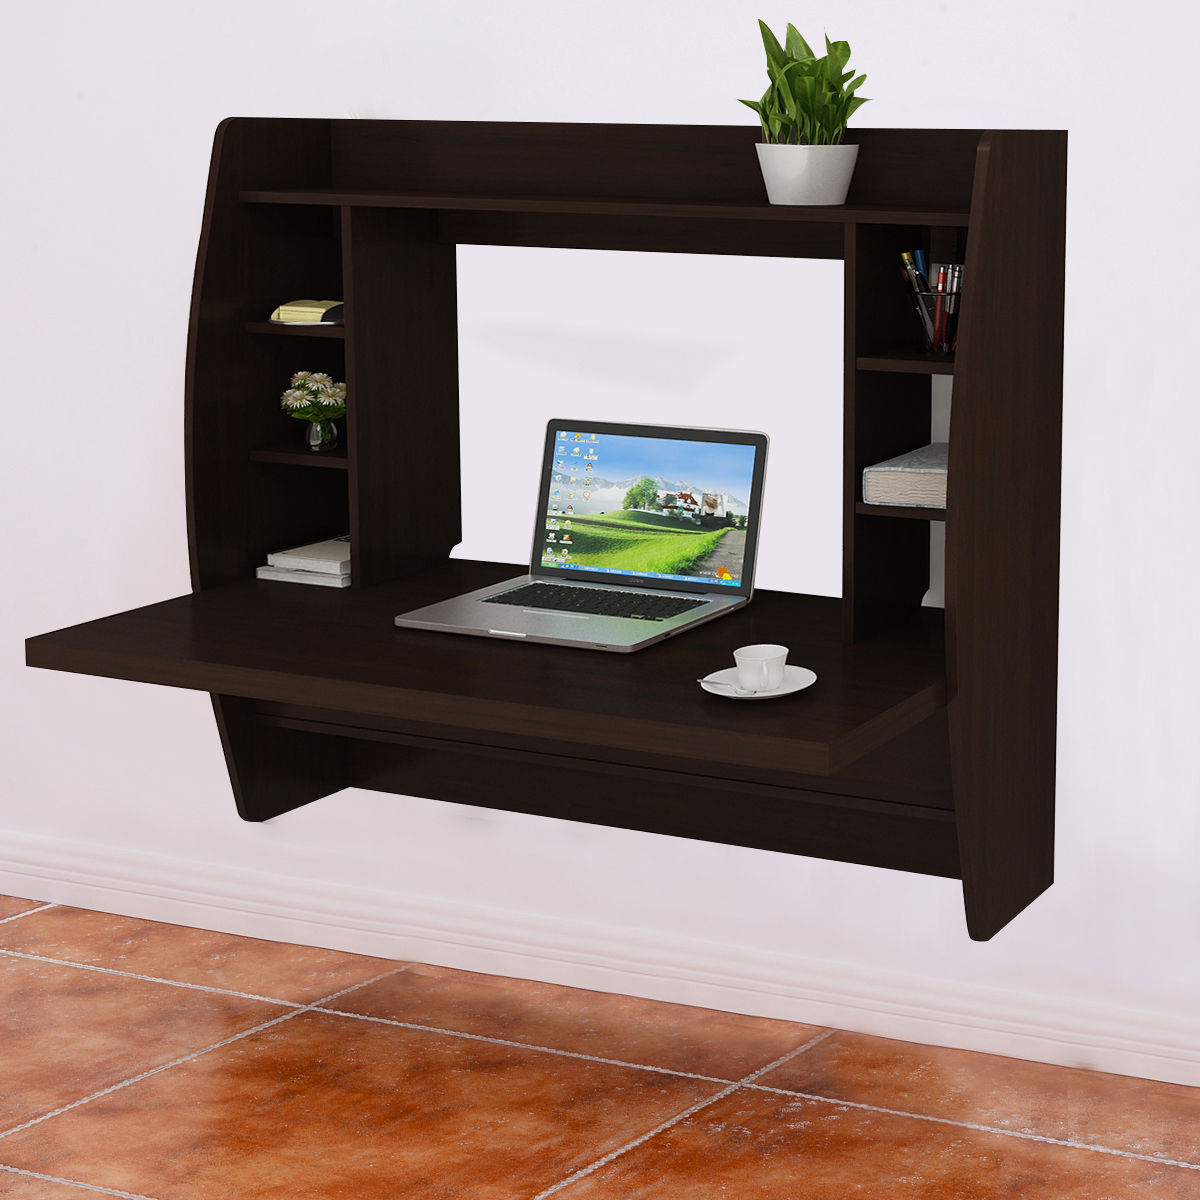 Floating Computer Desk costway wall mount floating computer desk storage two shelf laptop